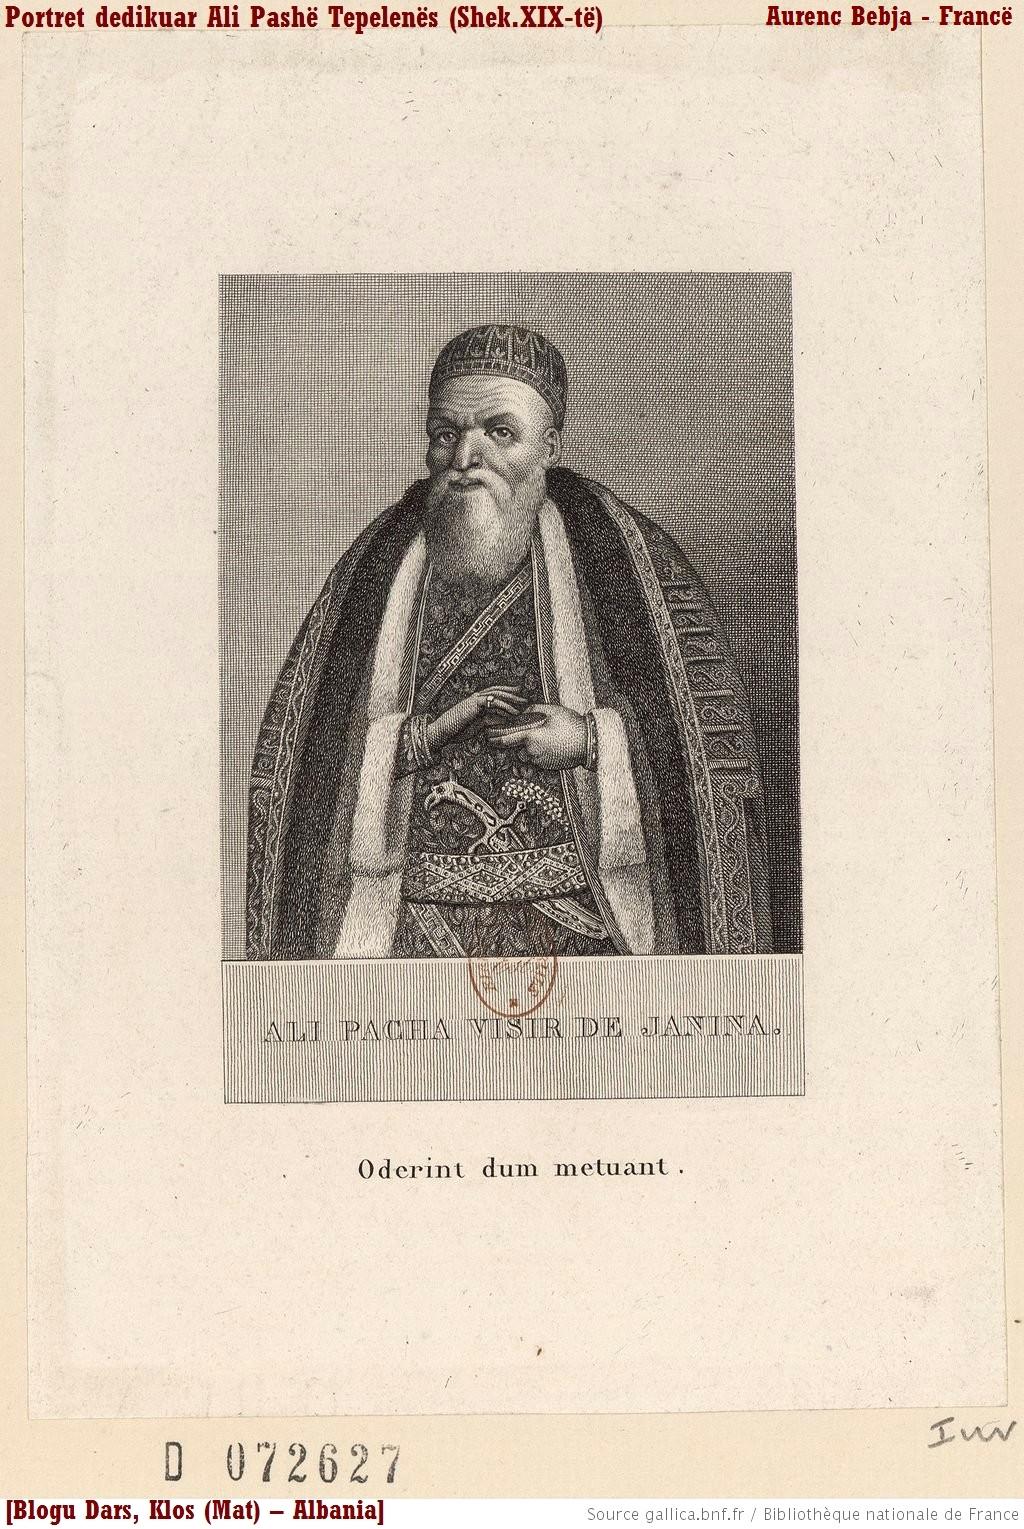 Ali Pasha13